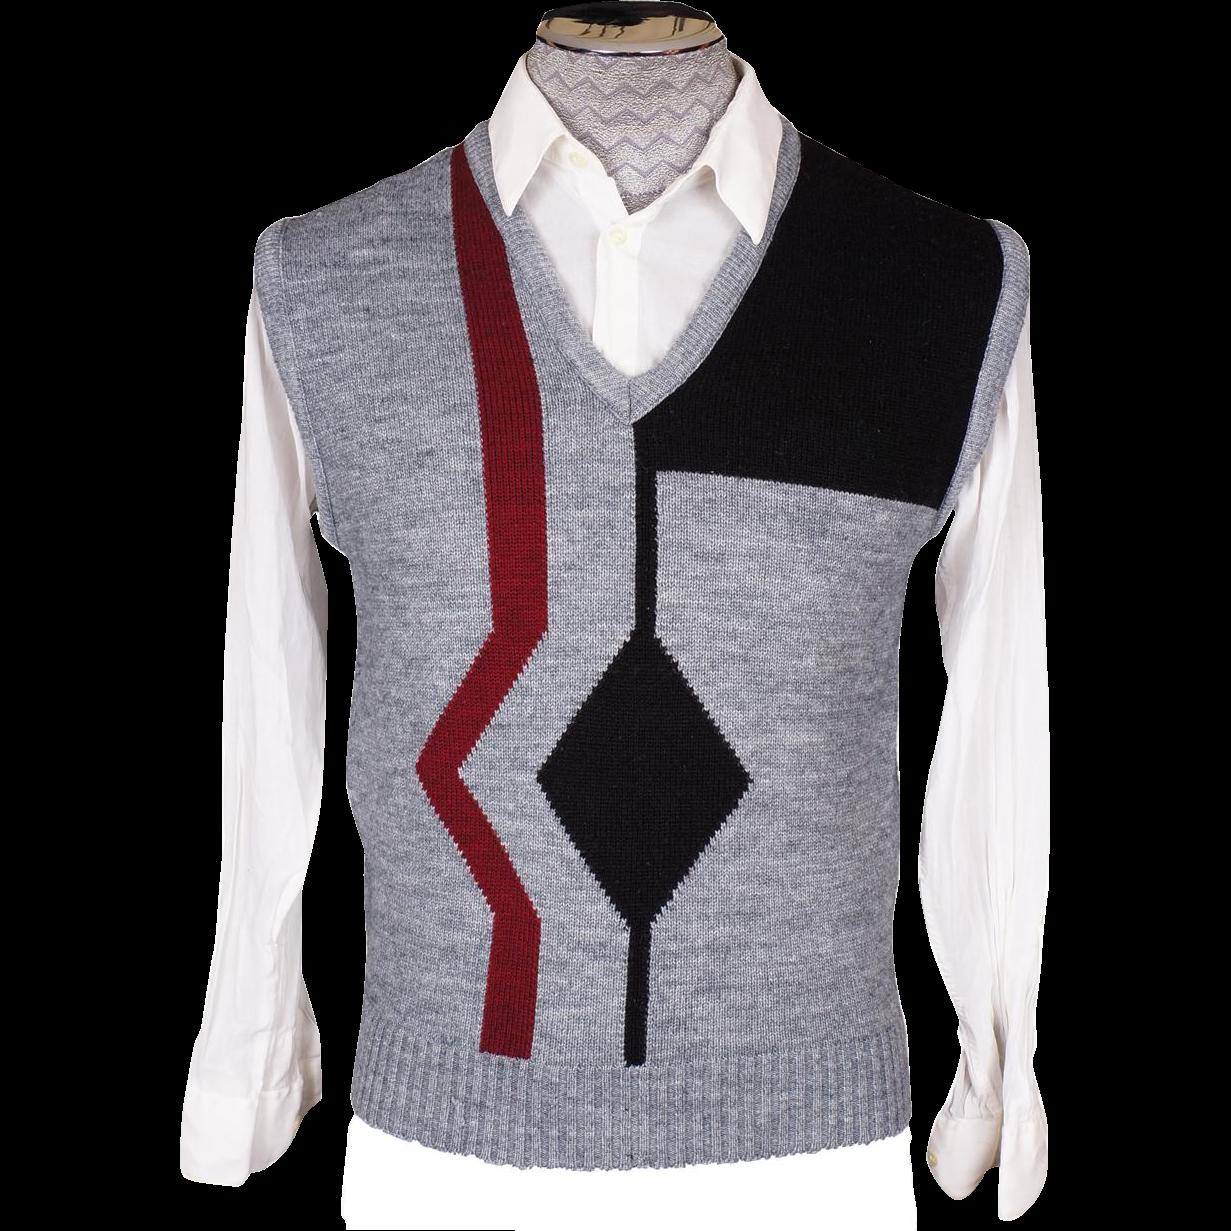 Maroon Sweater Vest